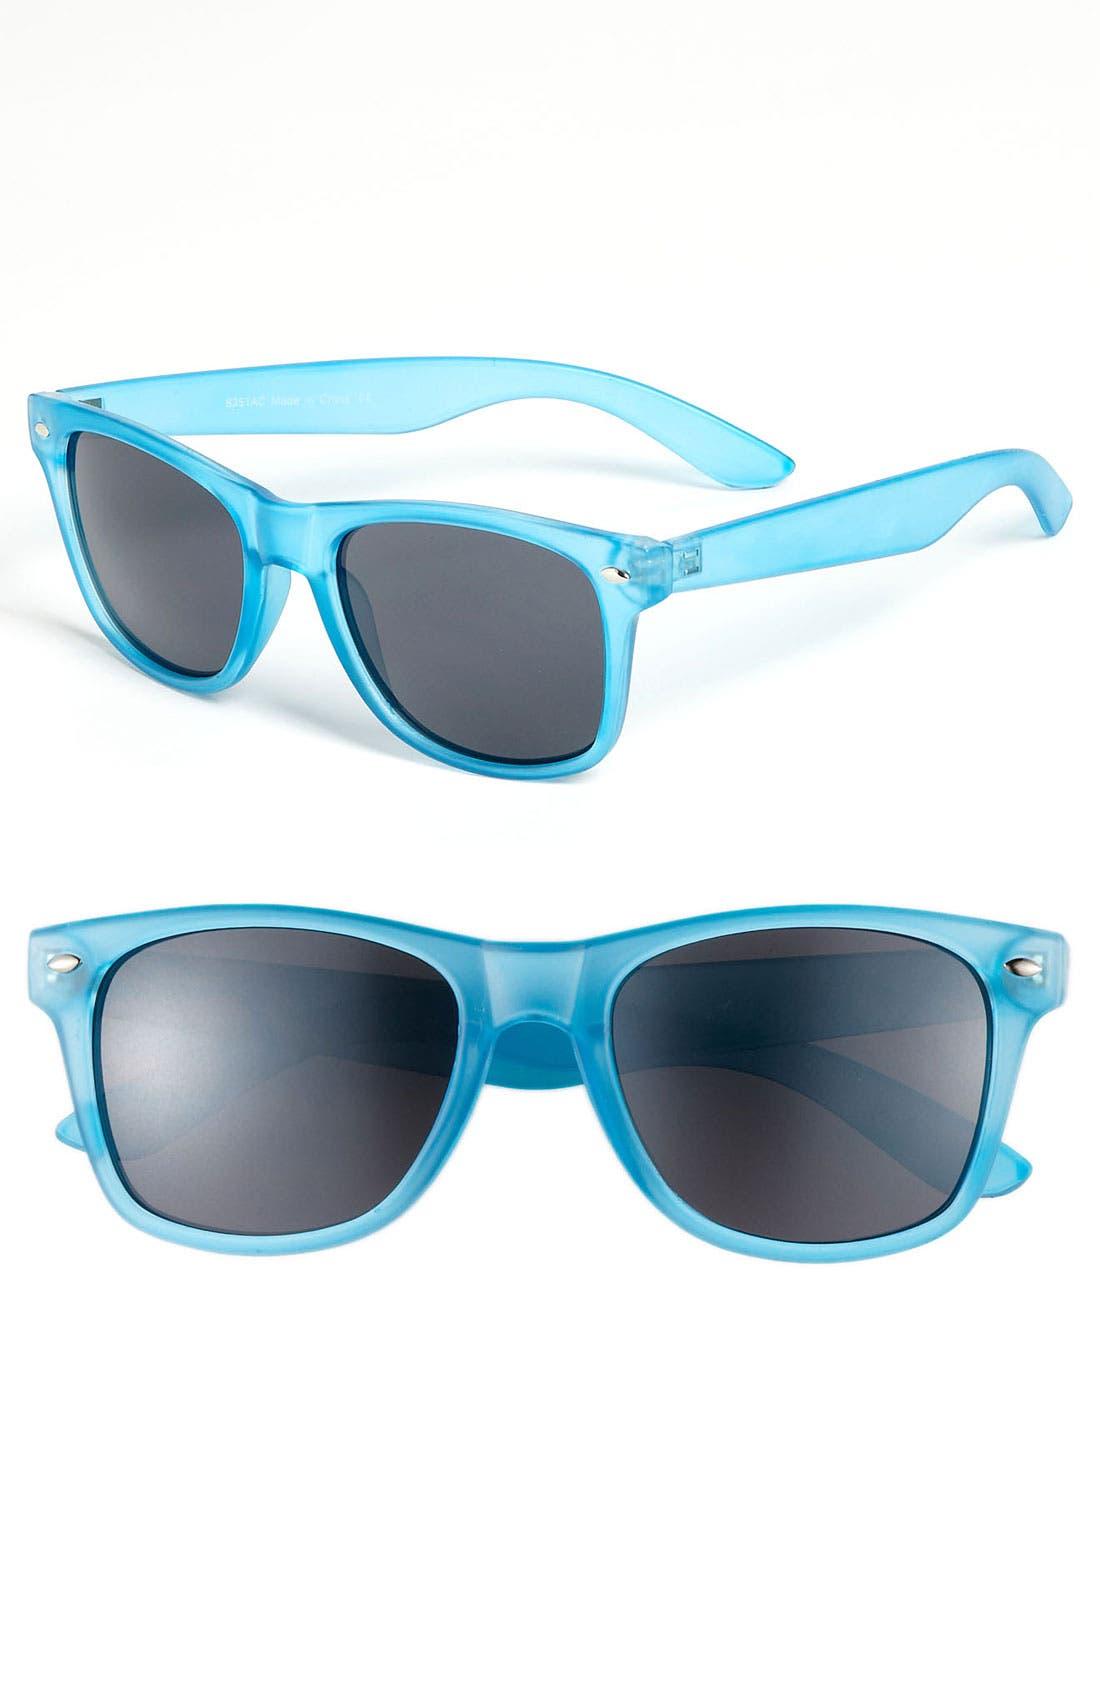 Alternate Image 1 Selected - KW 'Jazzed' Sunglasses